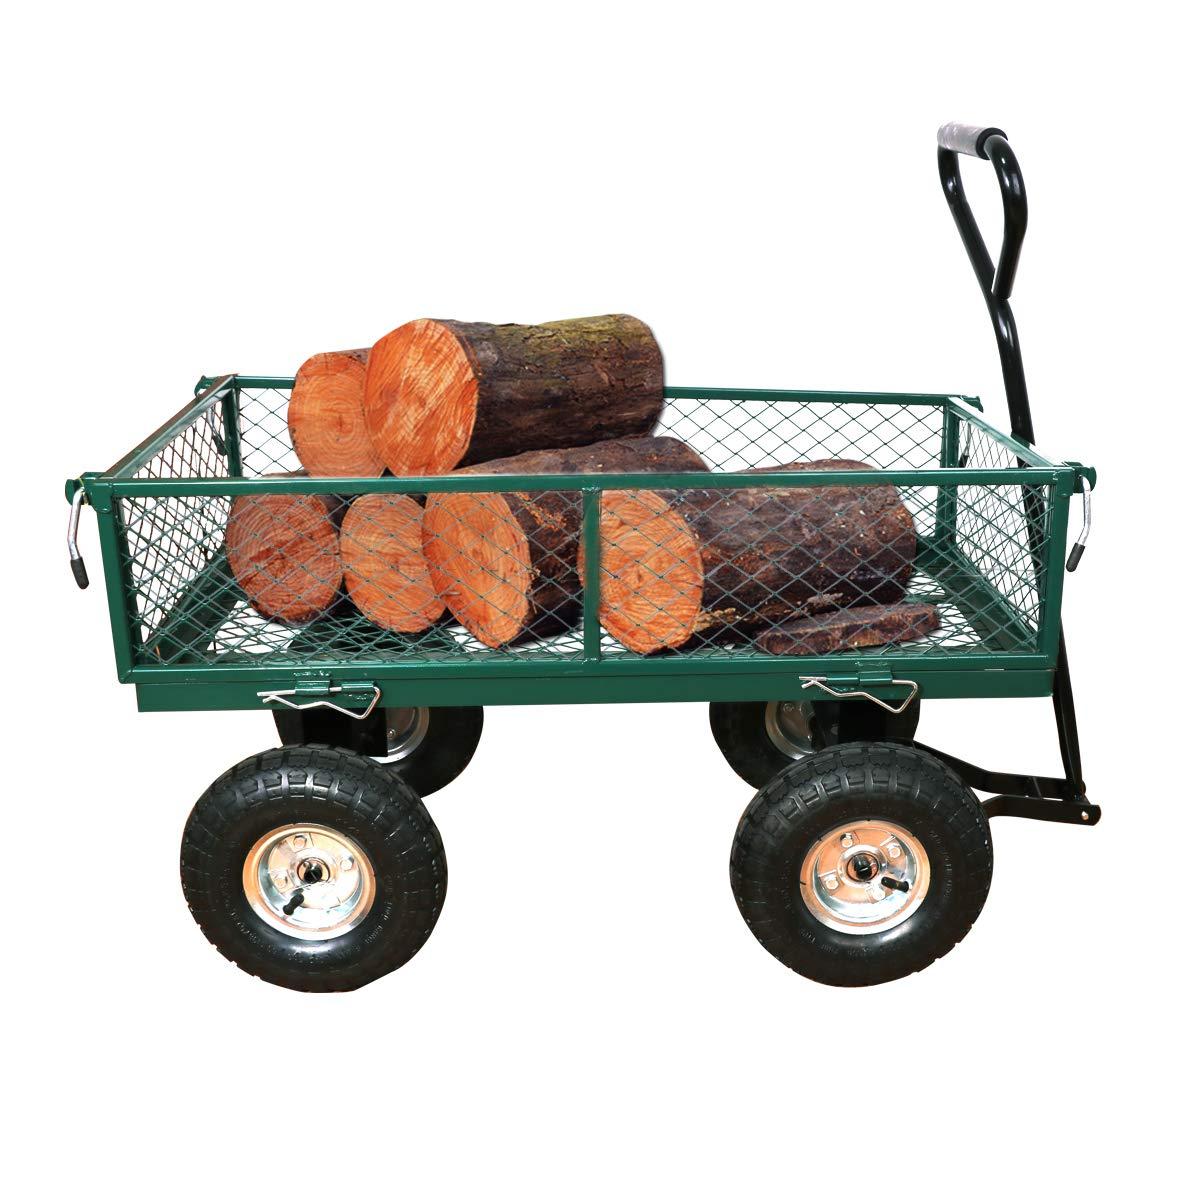 Yardeen Heavy Duty Garden Wagon Cart Steel Wheelbarrow Trailer Outdoor Yard Large Trolley Load Capacity 400LB Color Green by Yardeen